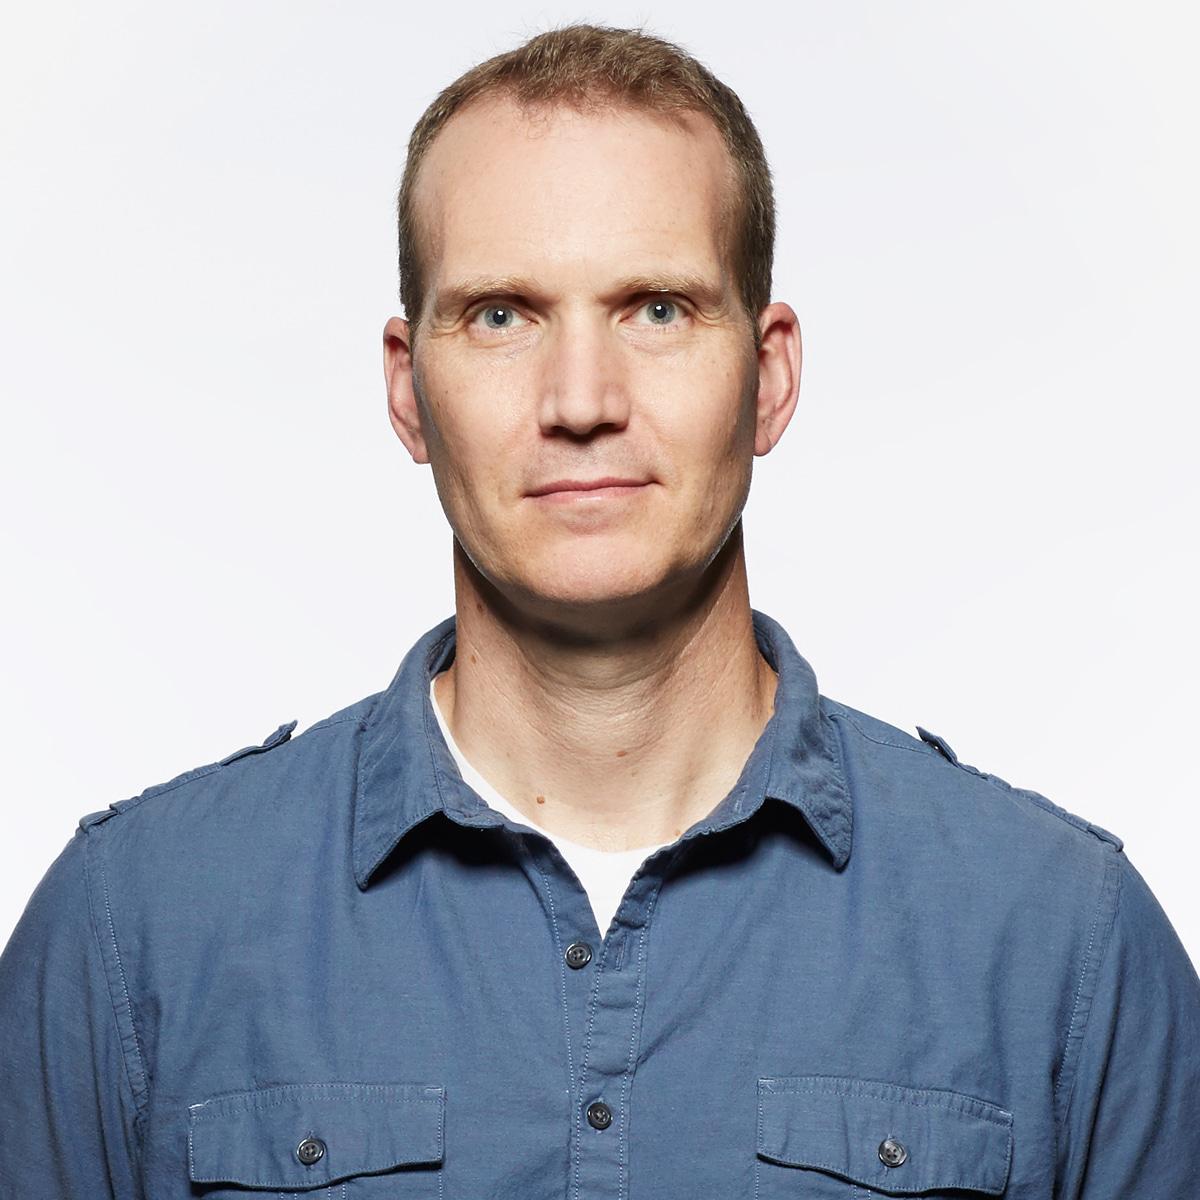 Josh Poduska